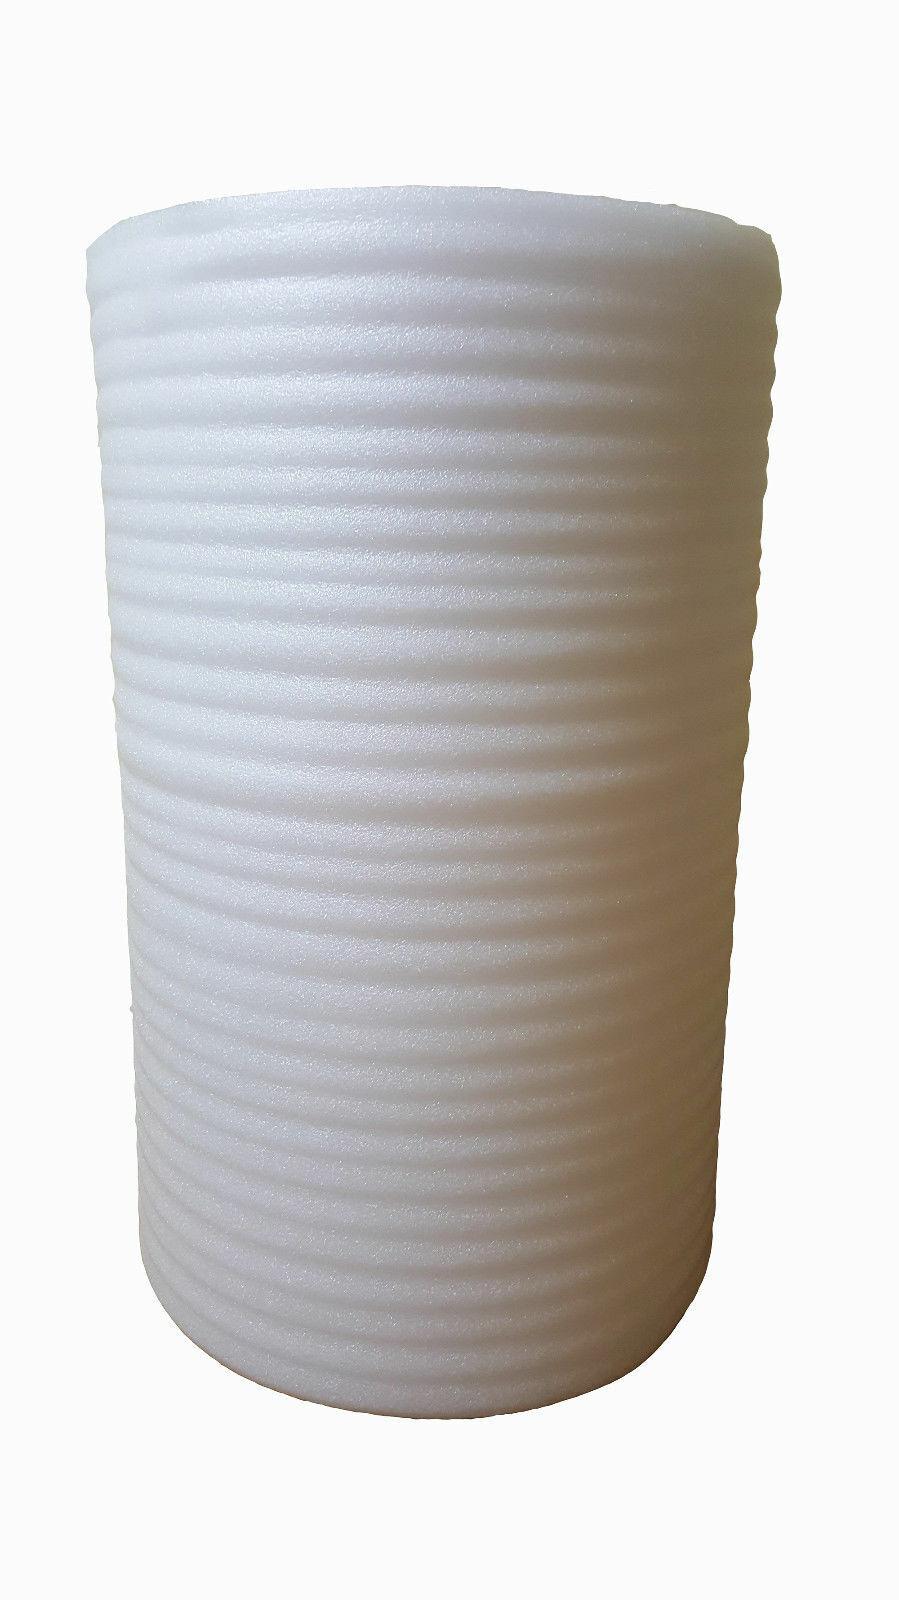 PARADOR Akustik Protect 200 Trittschalldämmung 7m² für Laminat Vinyl Parkett